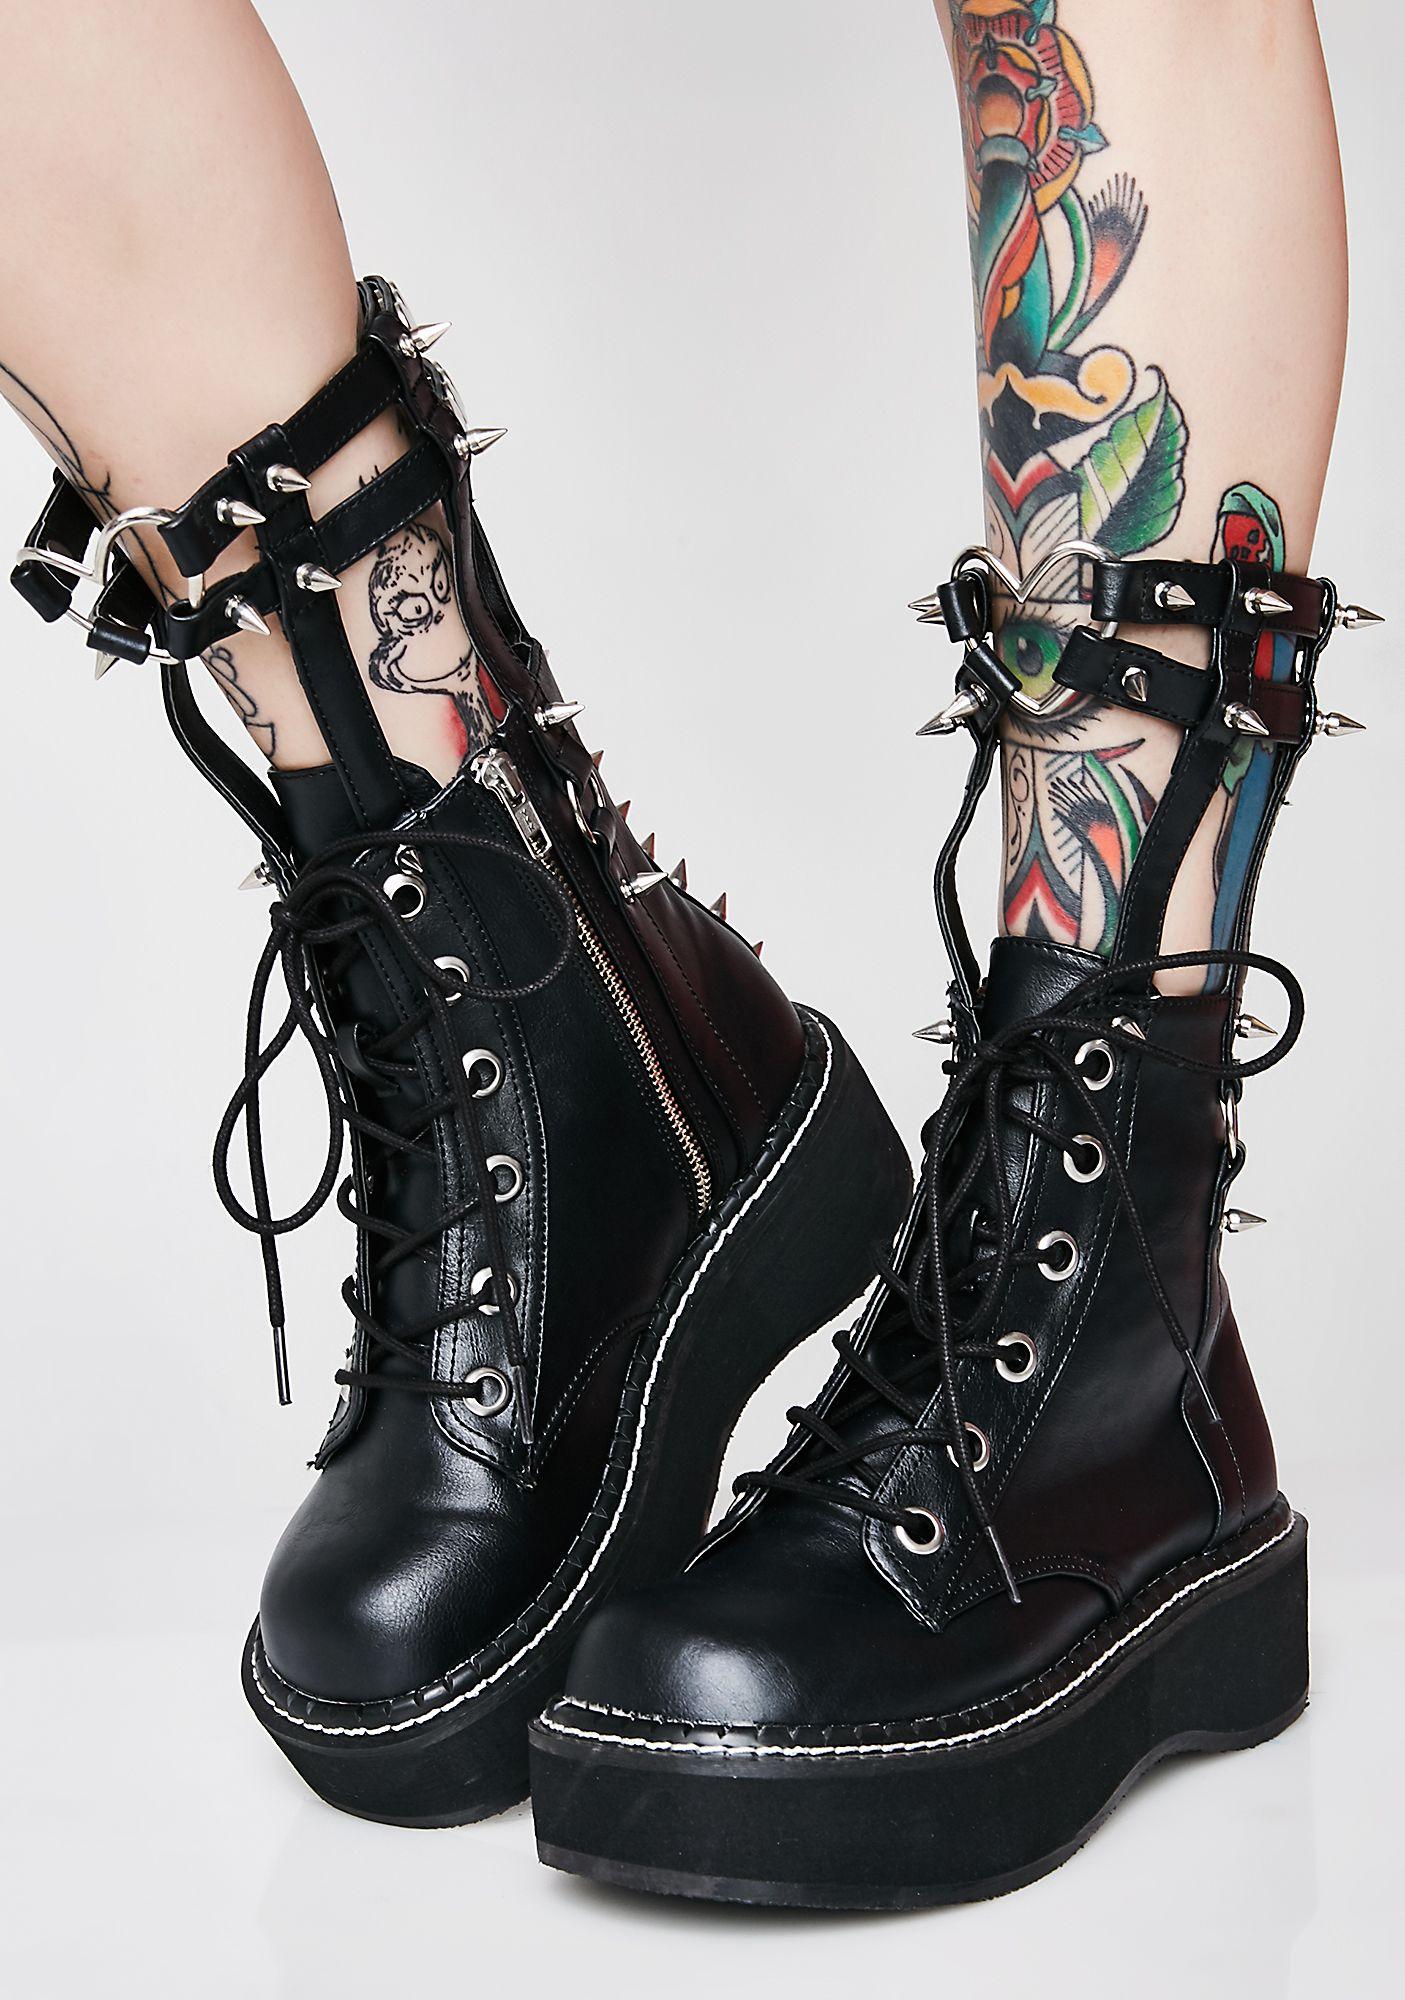 7d4a58ae76e Demonia Devil In Disguise Caged Boots  goth  punk  alternative